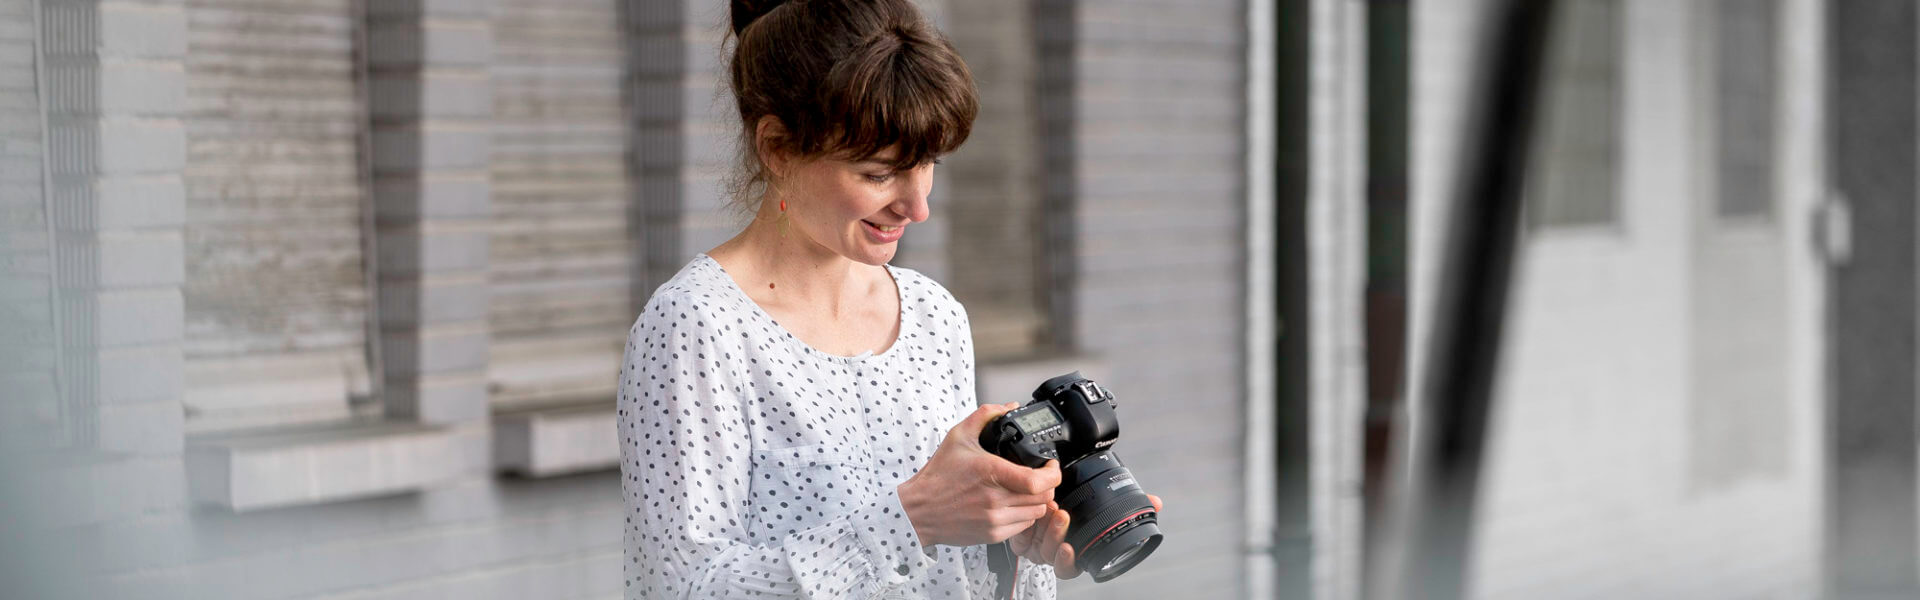 Mediamatiker Studentin Kamera Ausbildung